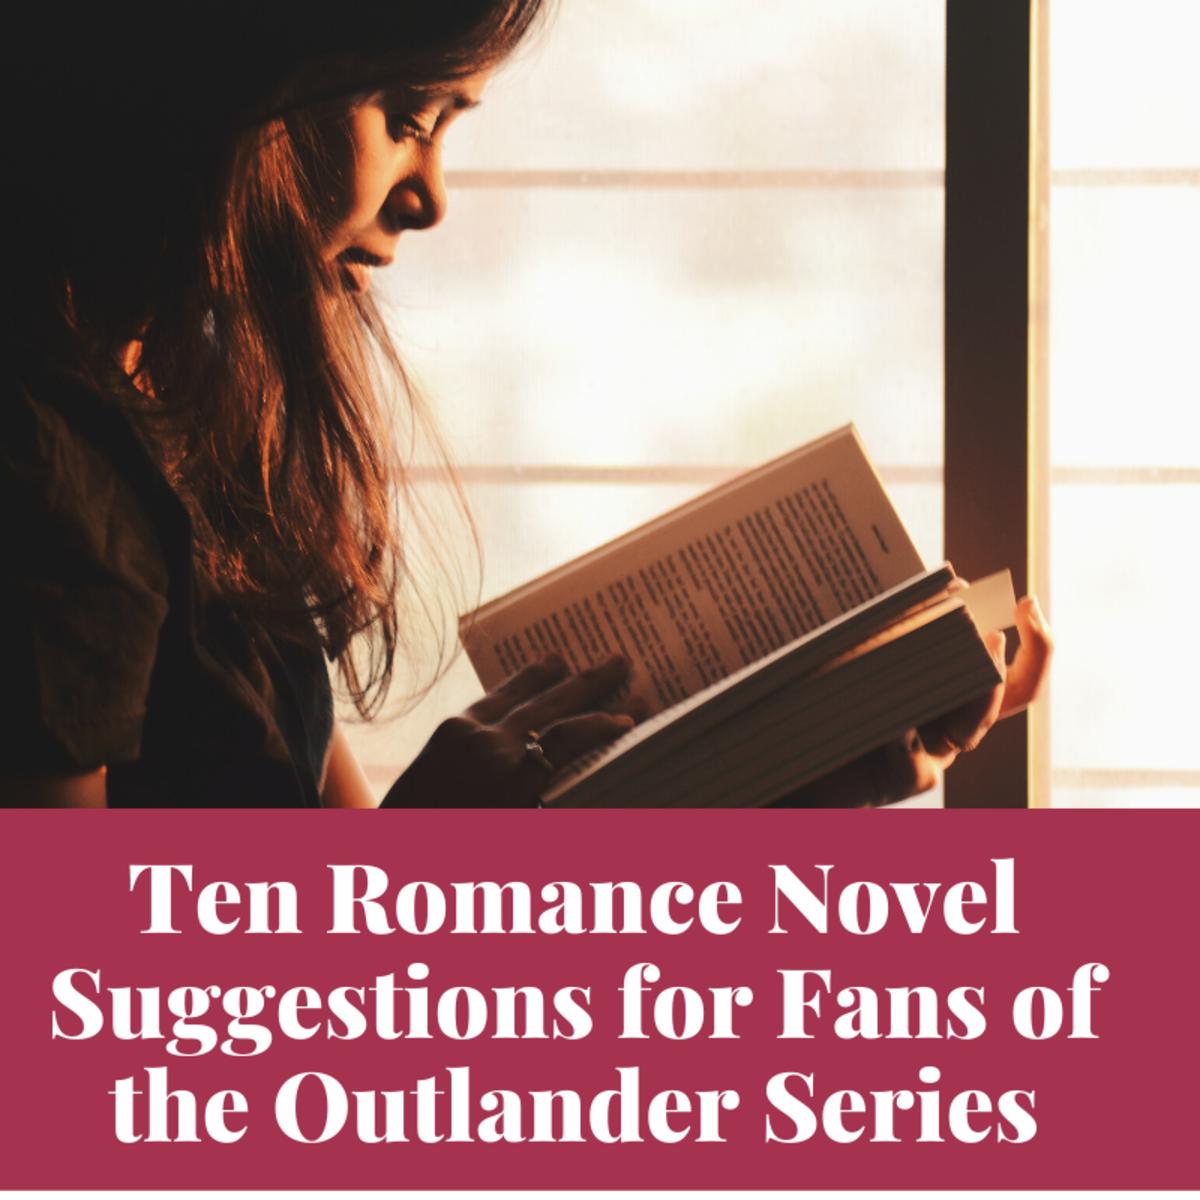 The Ten Best Time Travel Romance Novels for Fans of Outlander